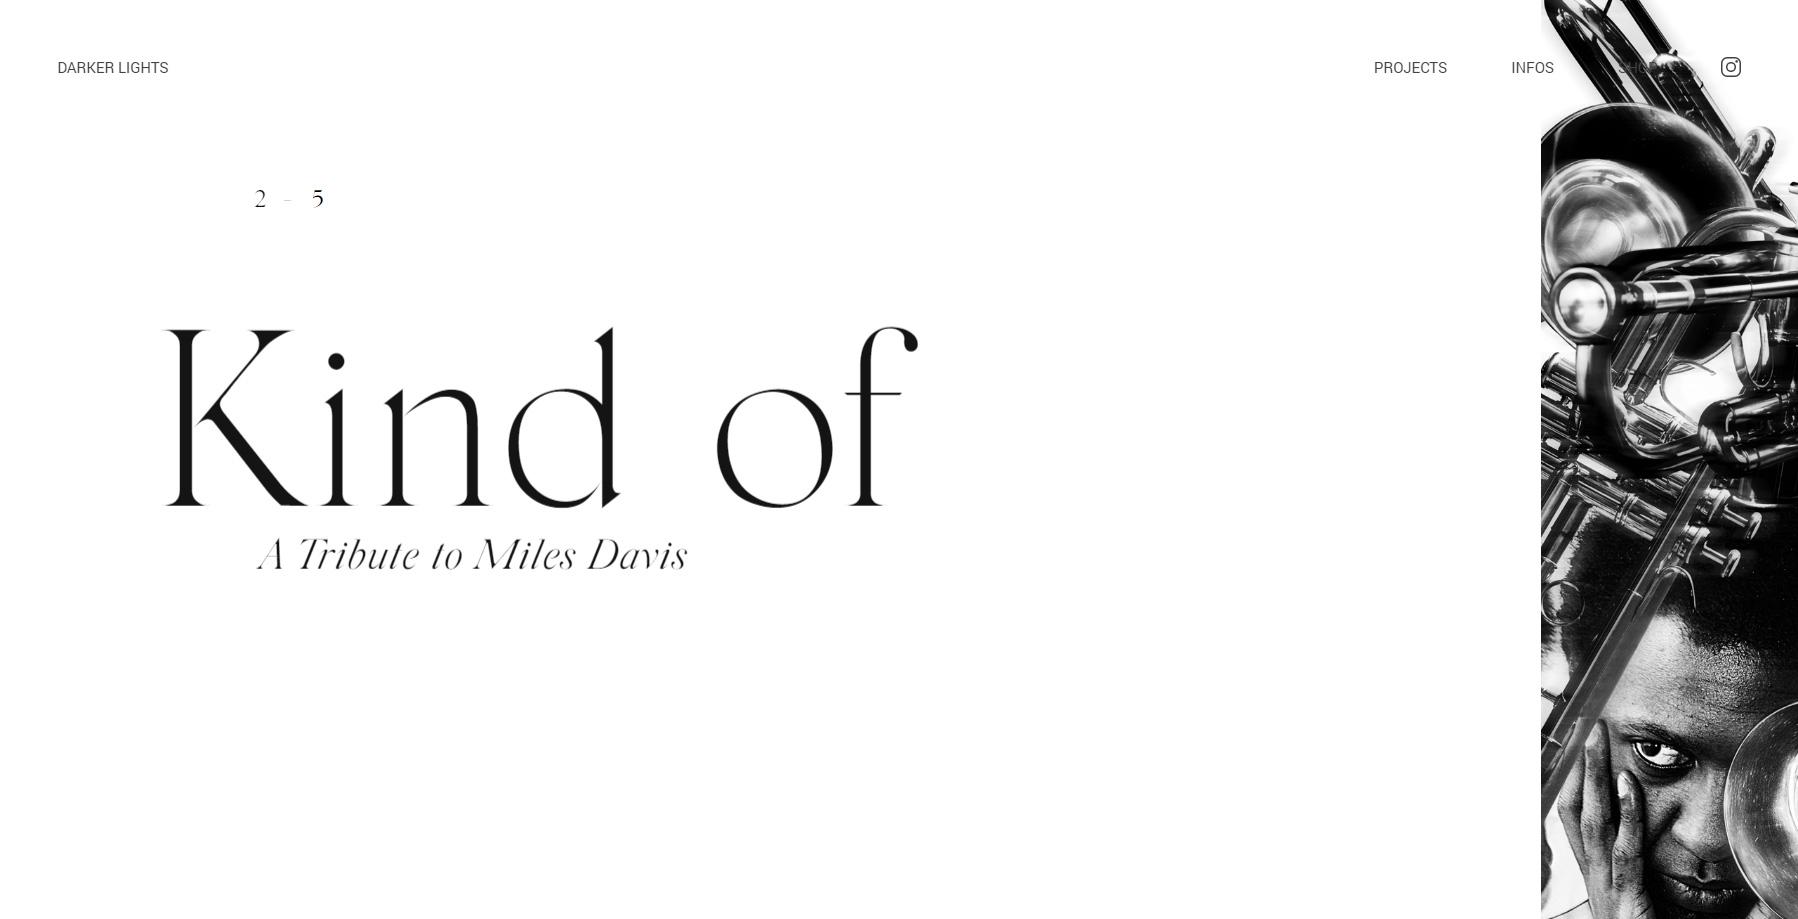 Darker Lights - Website of the Day